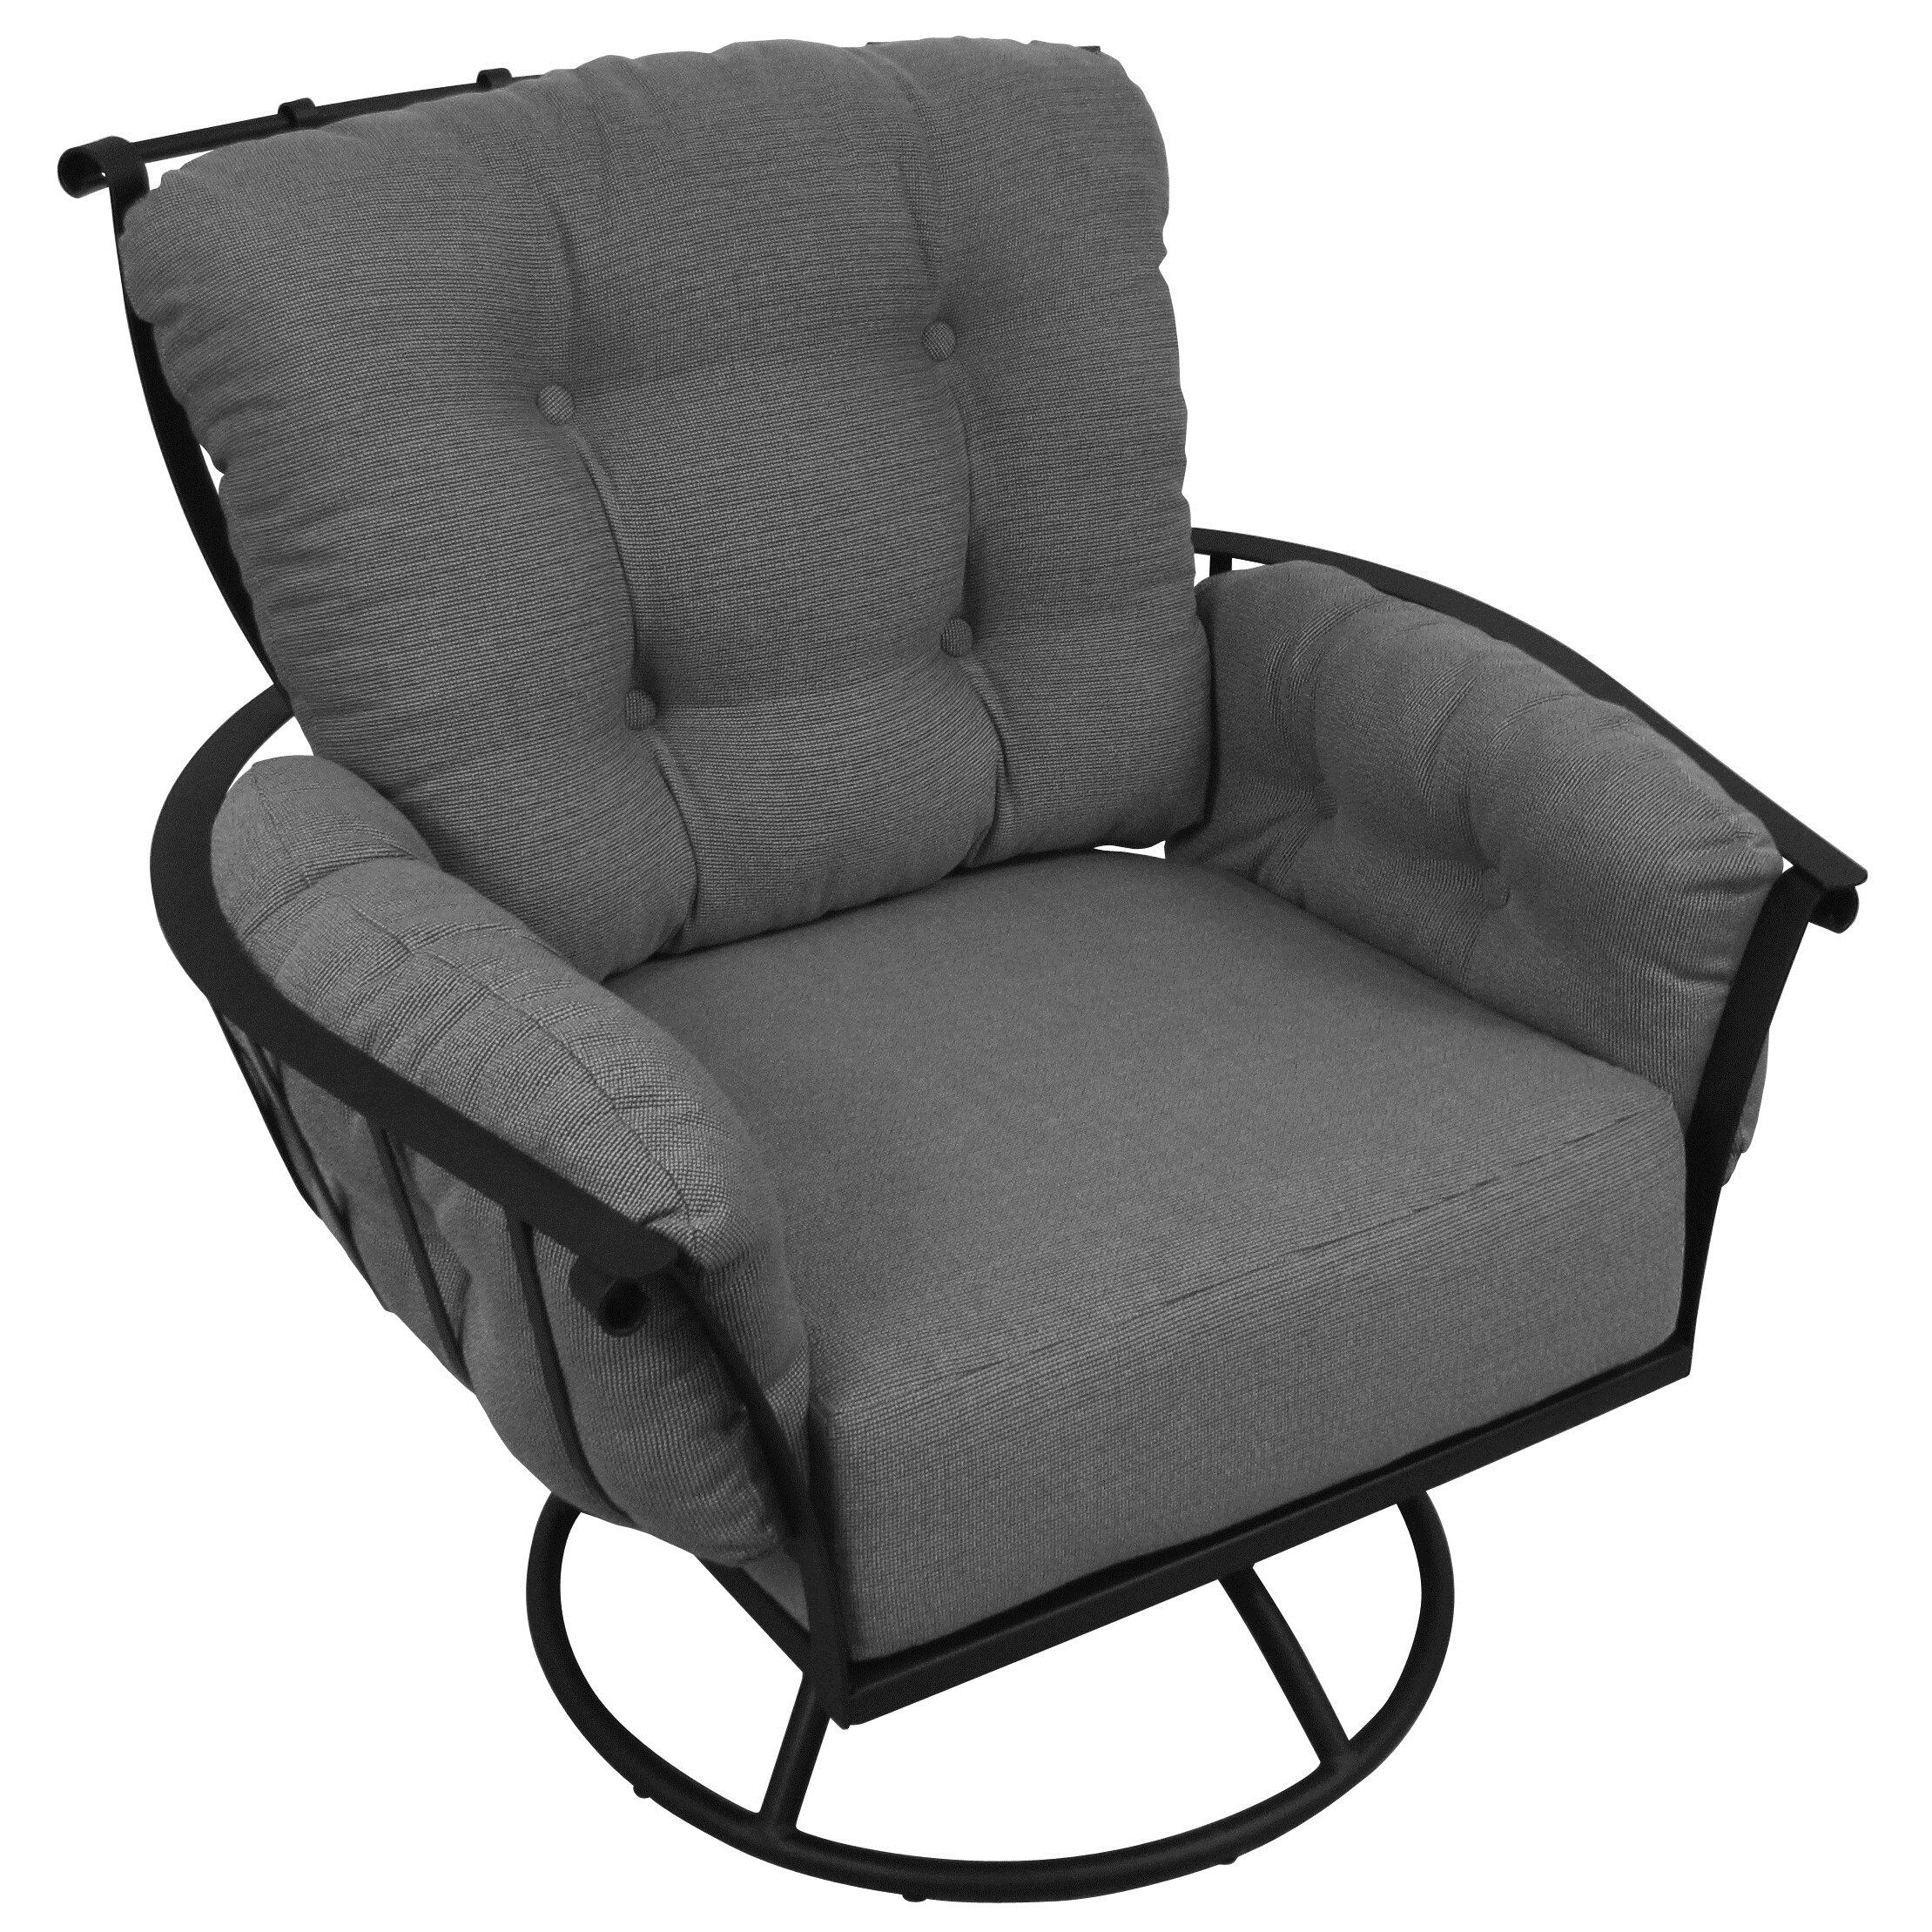 Meadowcraft Swivel Rocking Chair with Cushions & Reviews  Wayfair.ca